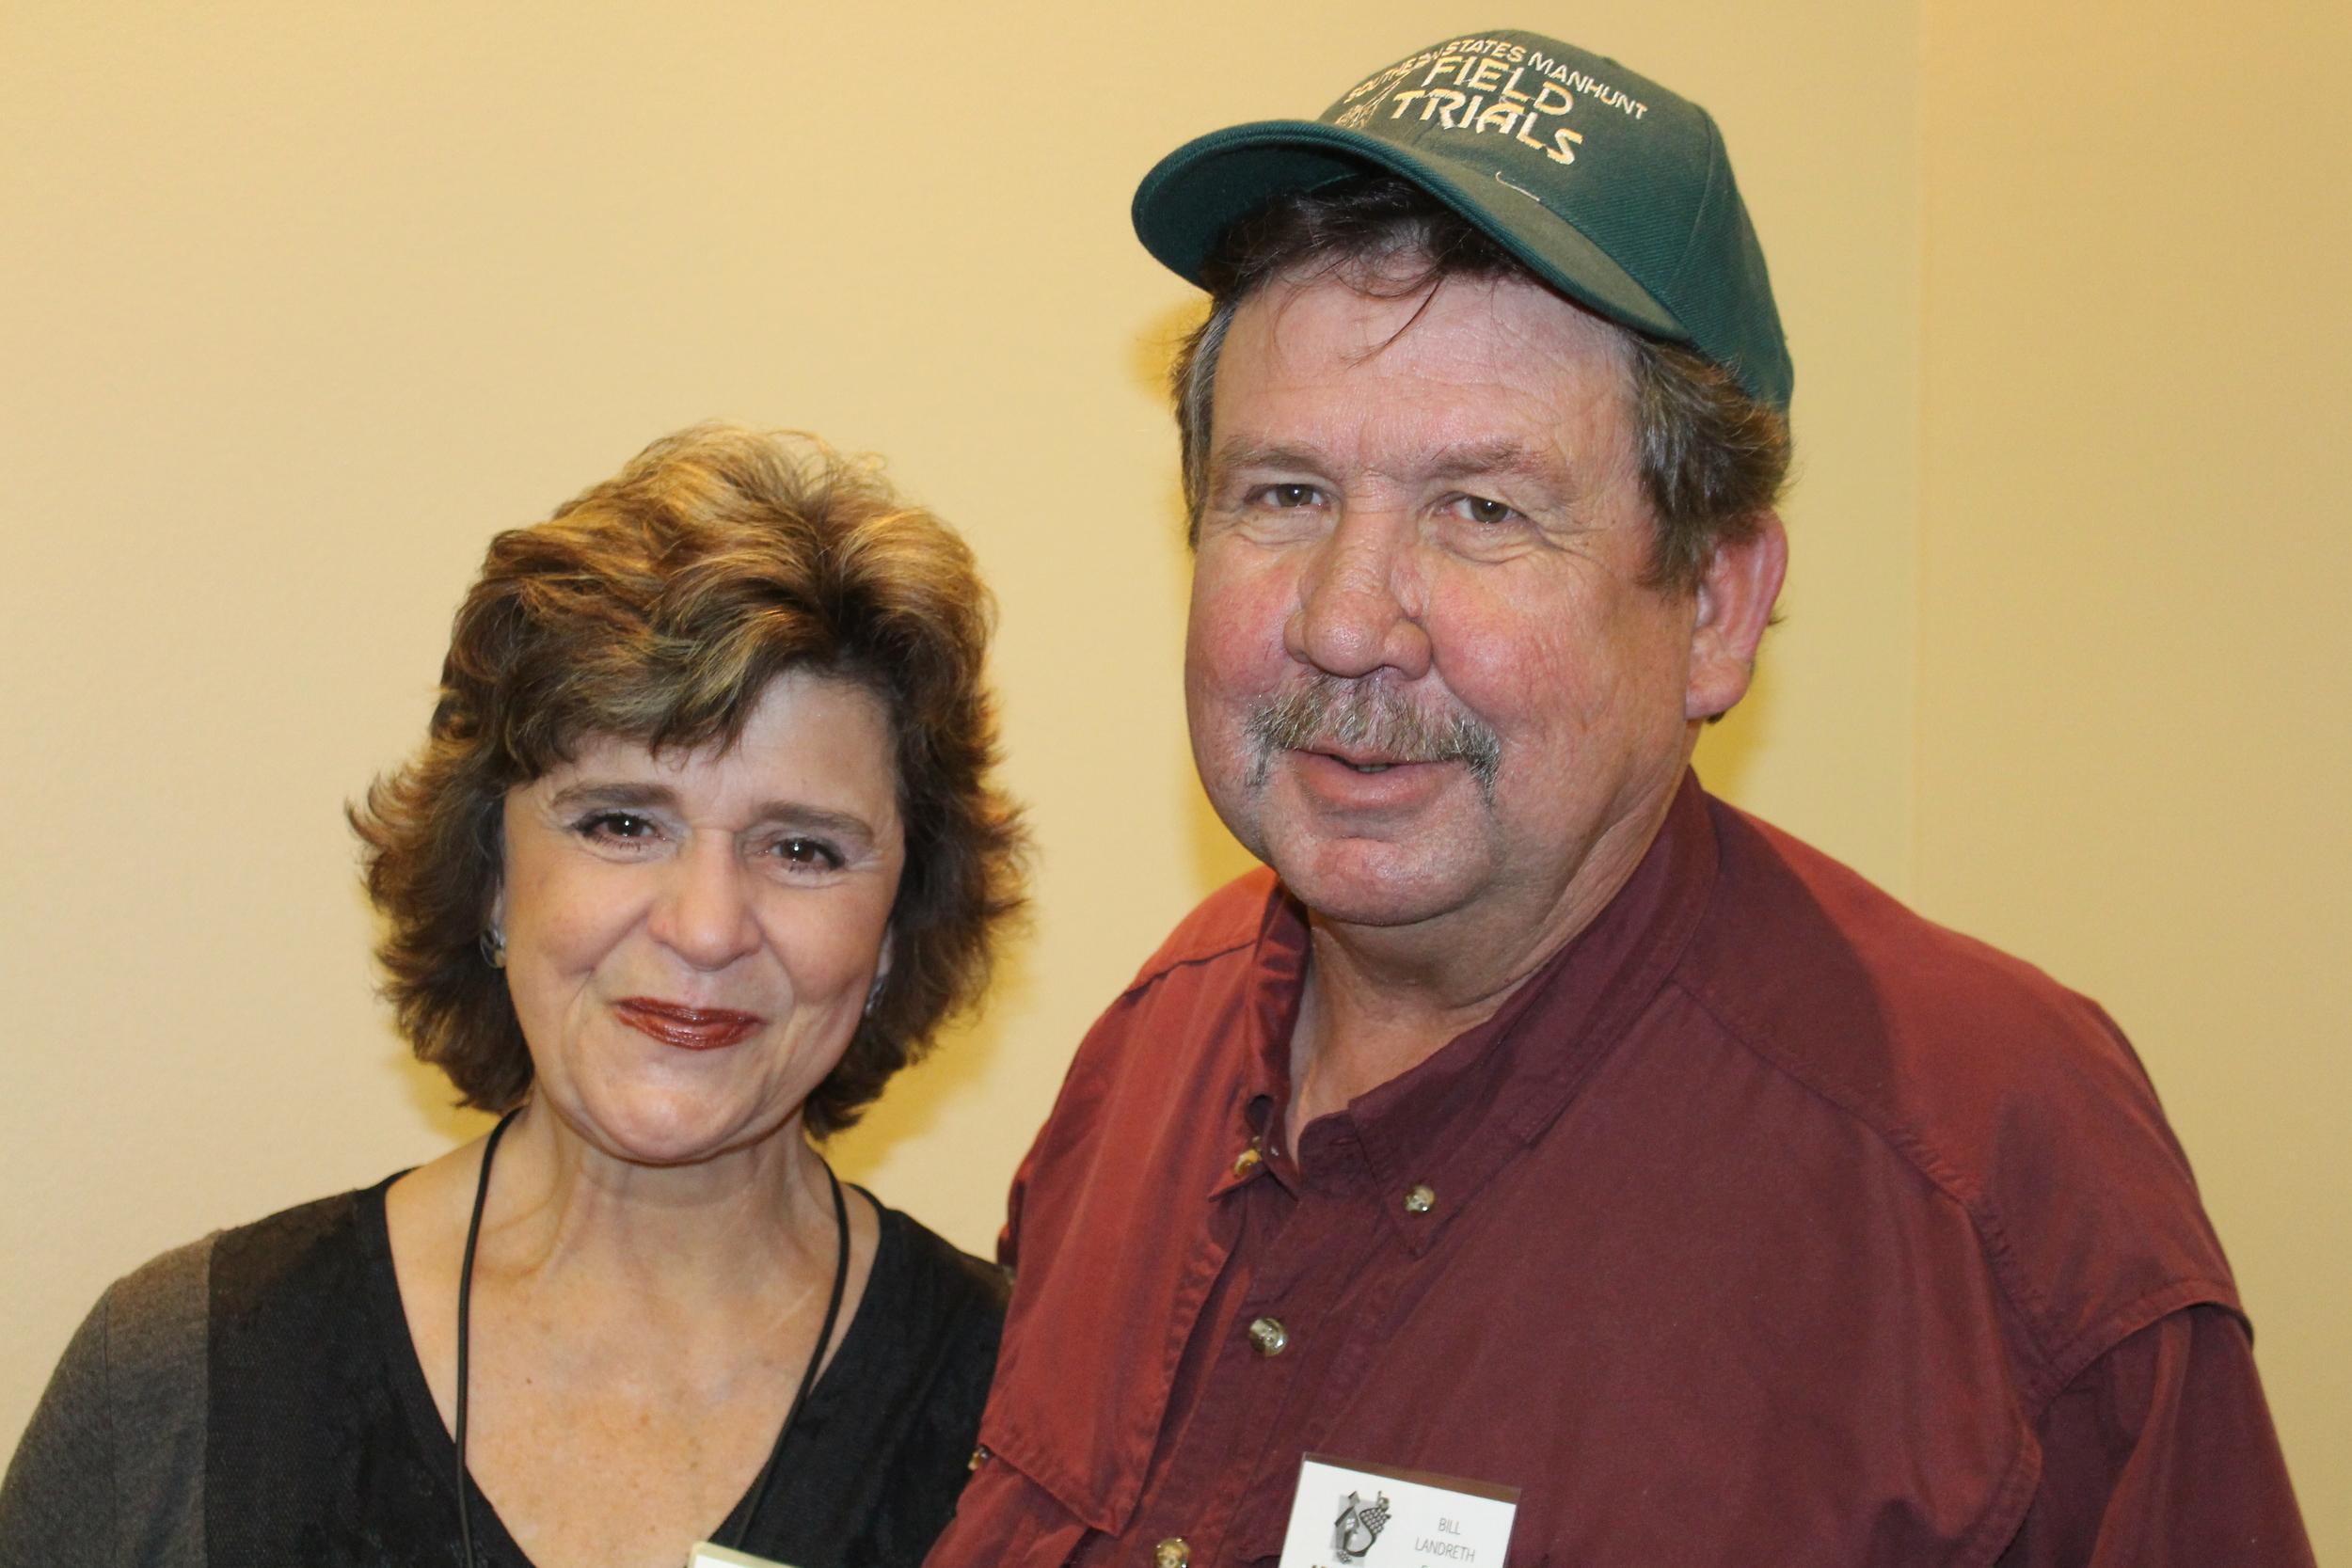 Beverly Dunaway, U of A Program Associate/MarketMaker and Bill Landreth, Owner/Farmer